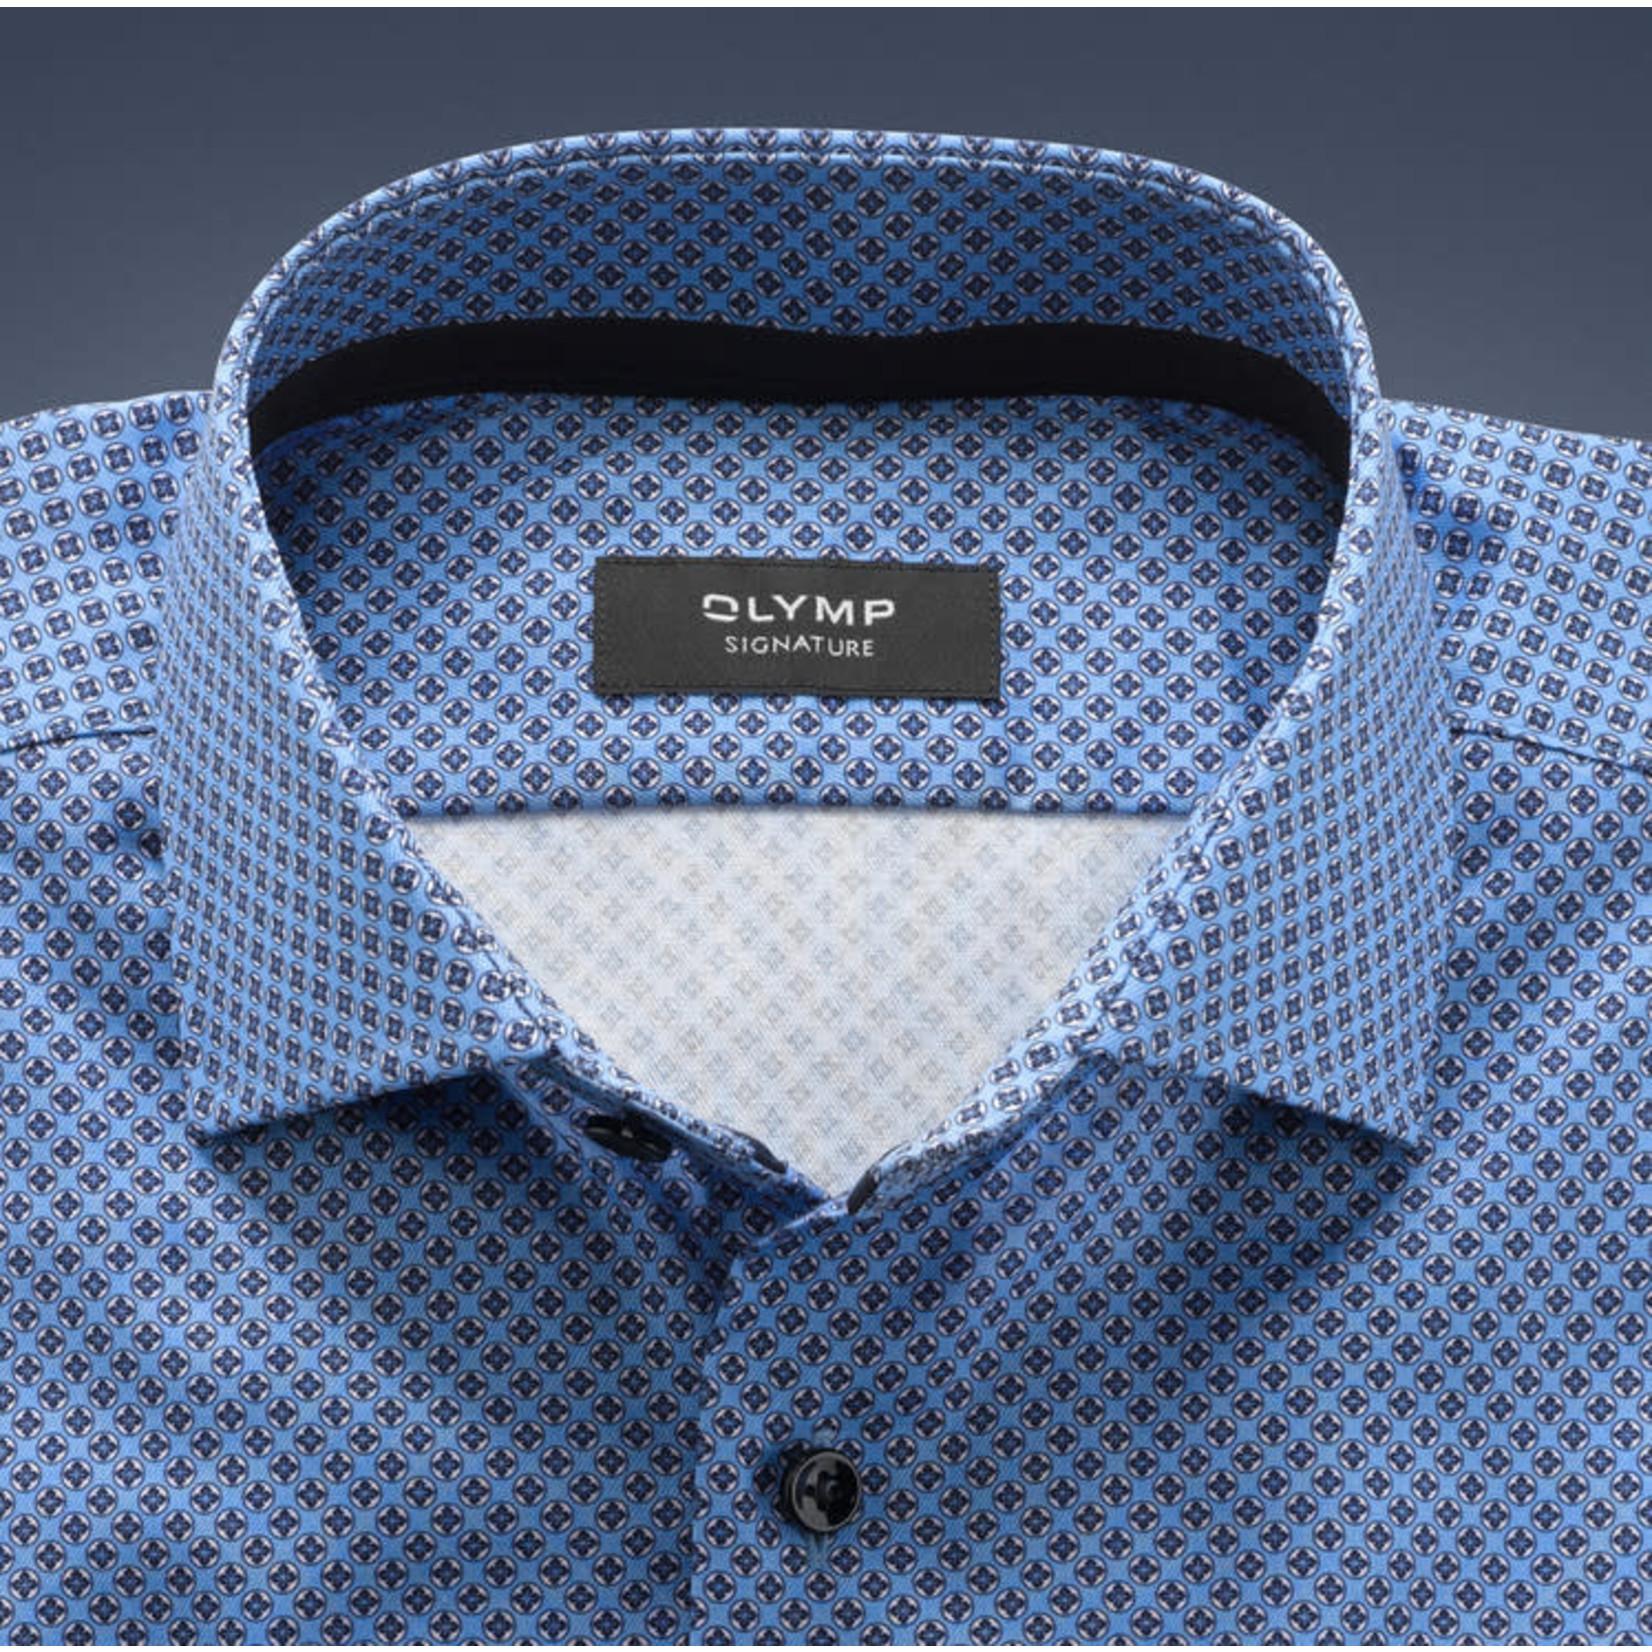 Olymp Signature tailored fit overhemd blauw print